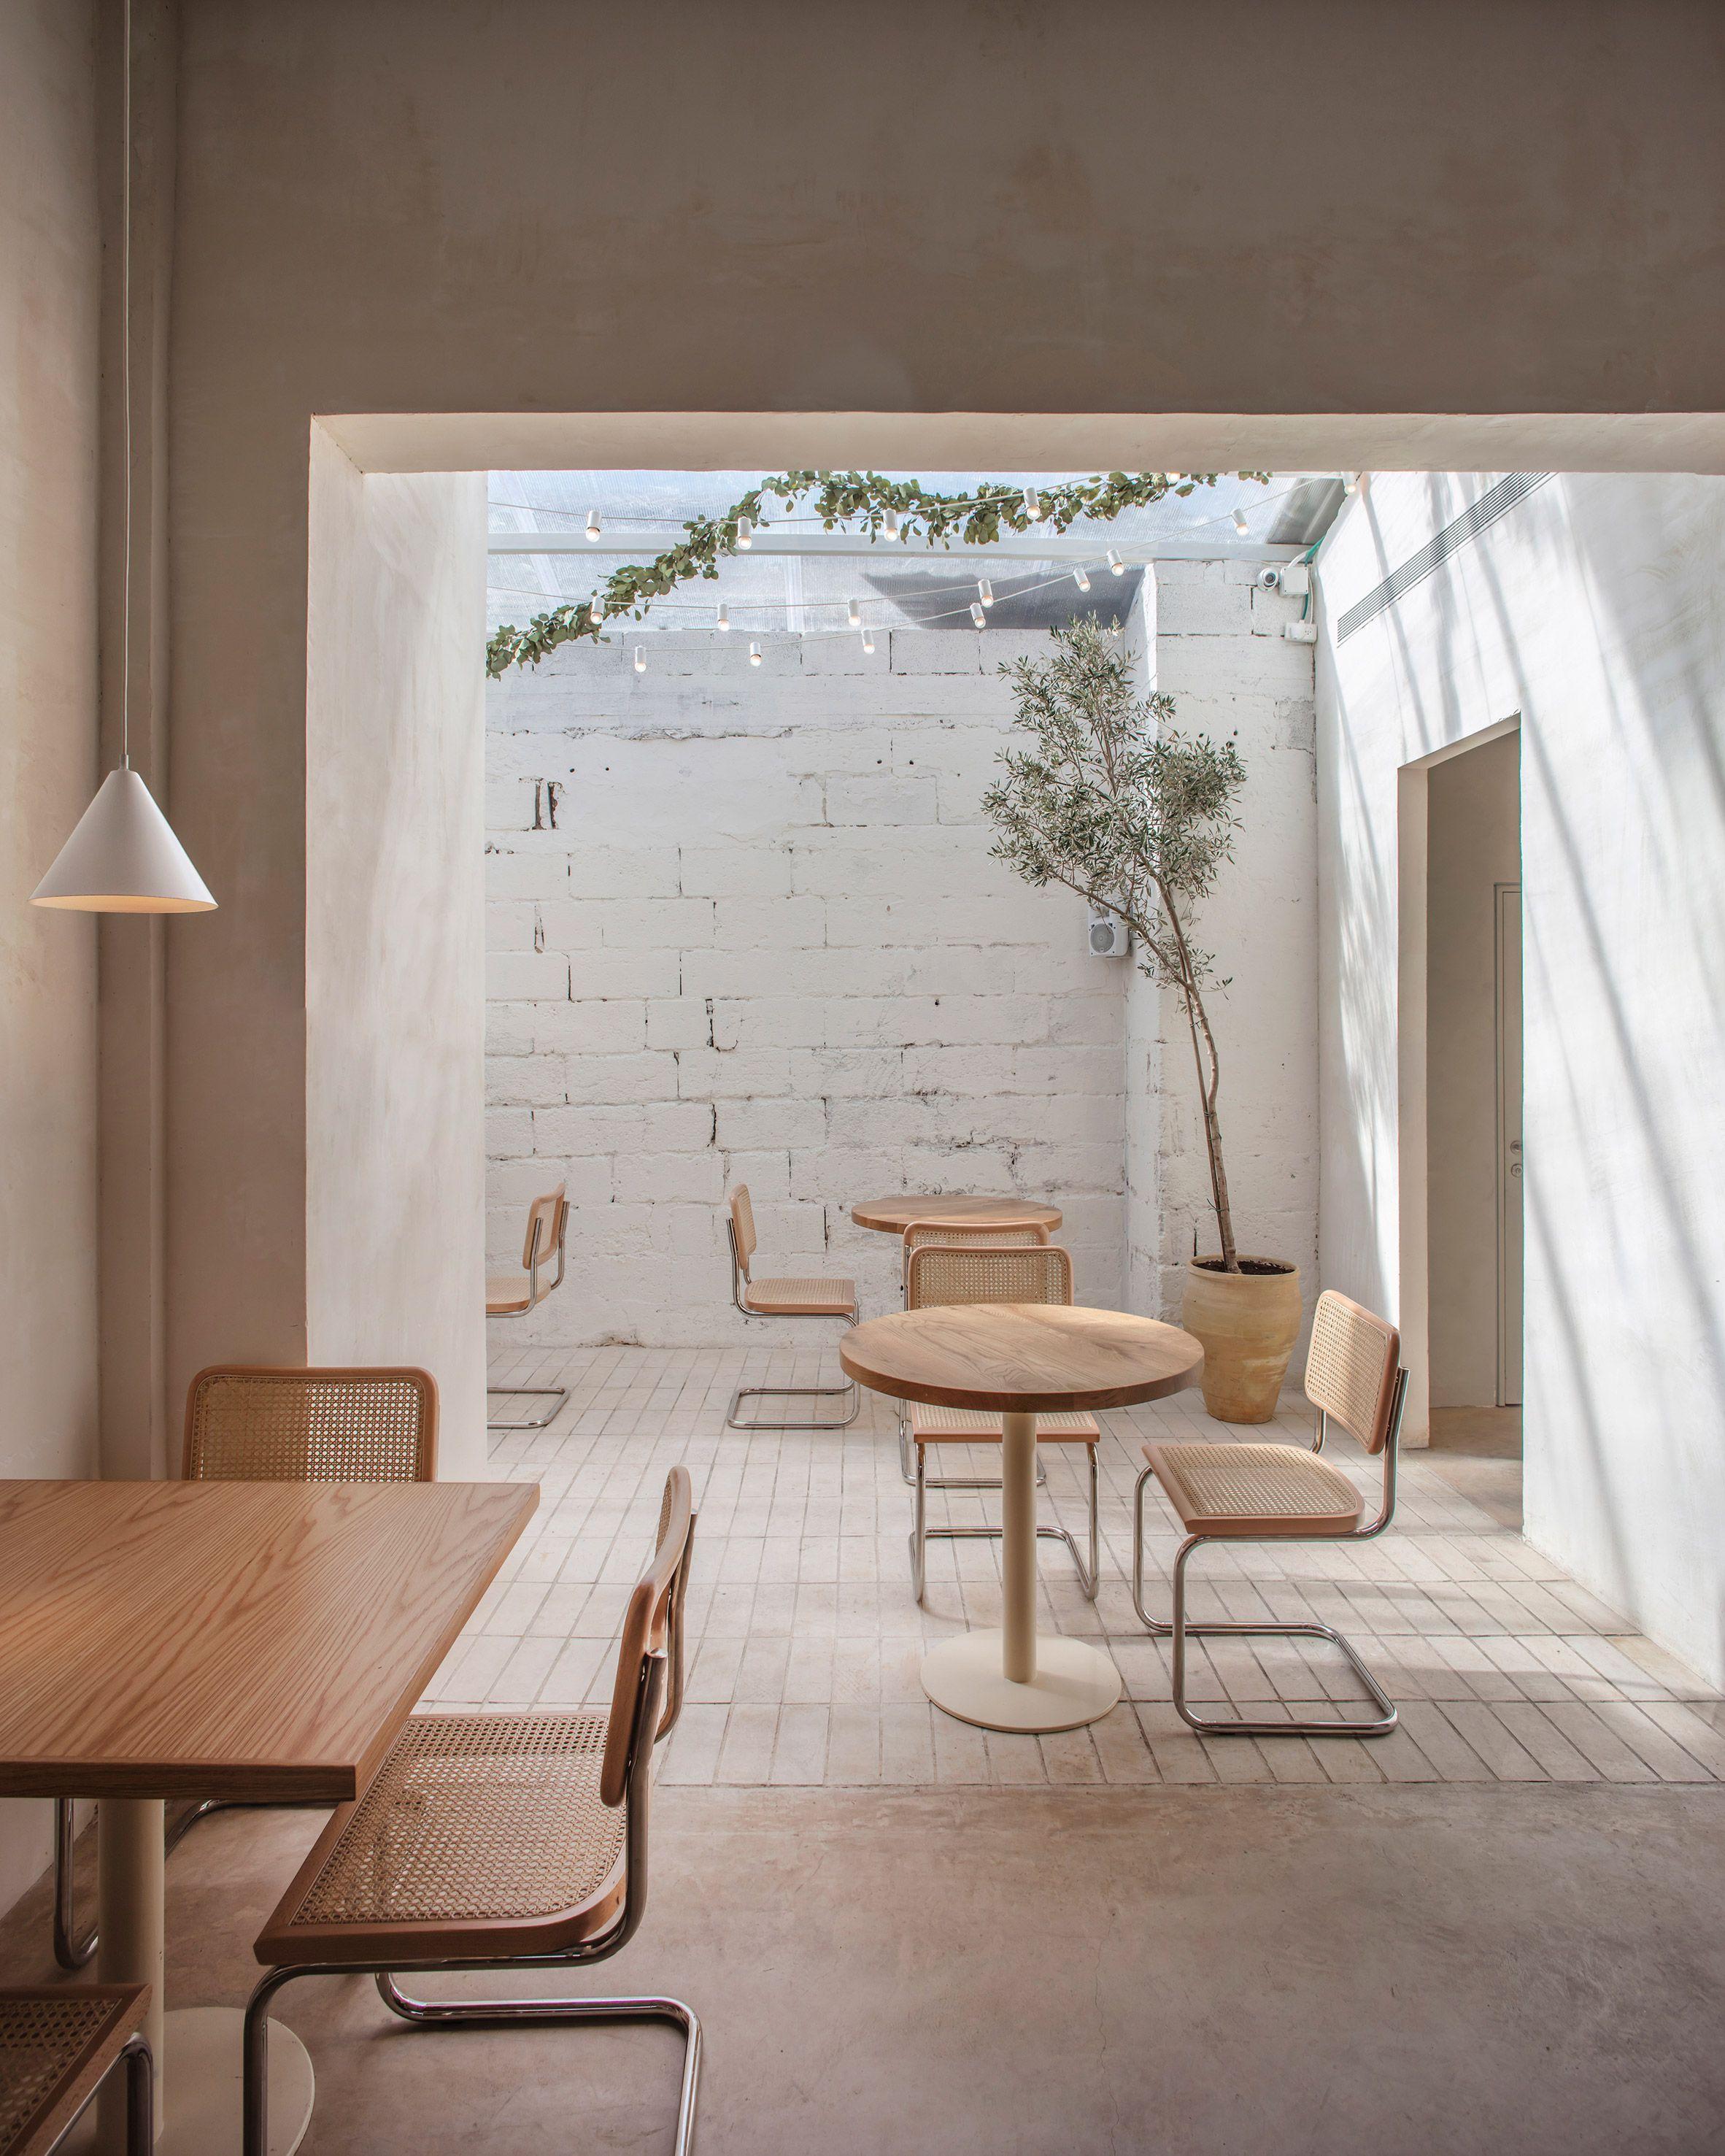 Helmed by chef Shirel Berger, plant-based restaurant Opa is designed by architect and interior designer, Vered Kadouri, alongside Tel Aviv design house Craft & Bloom.